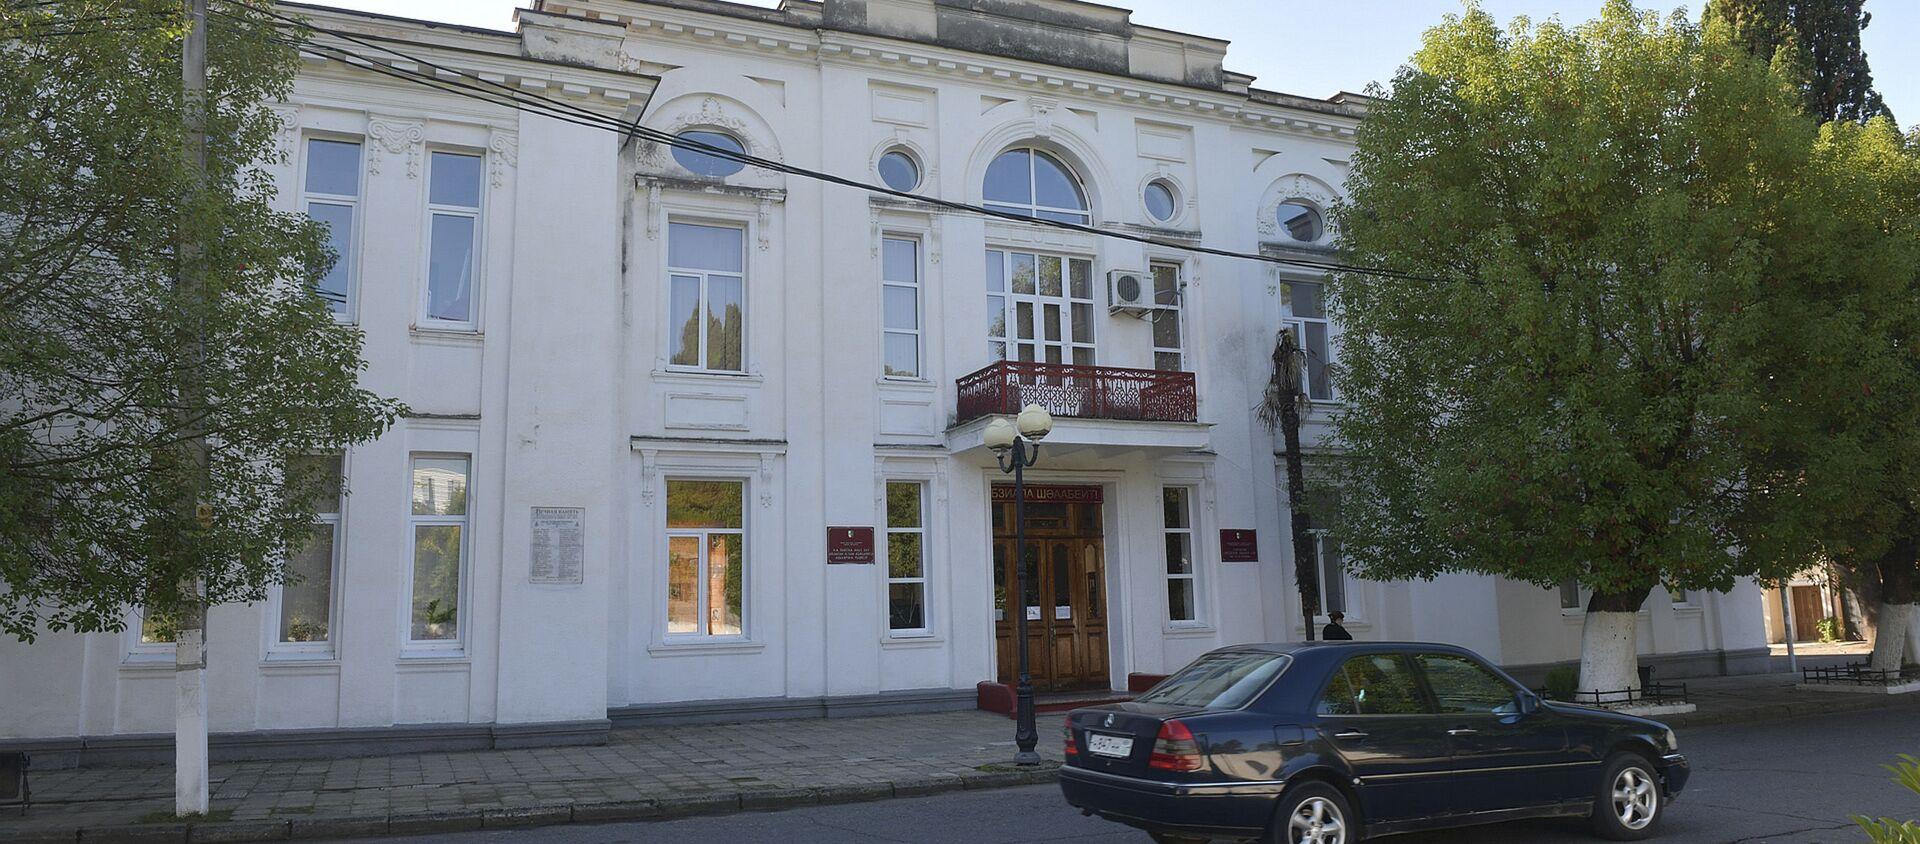 Cухумская школа № 10 - Sputnik Абхазия, 1920, 29.09.2021